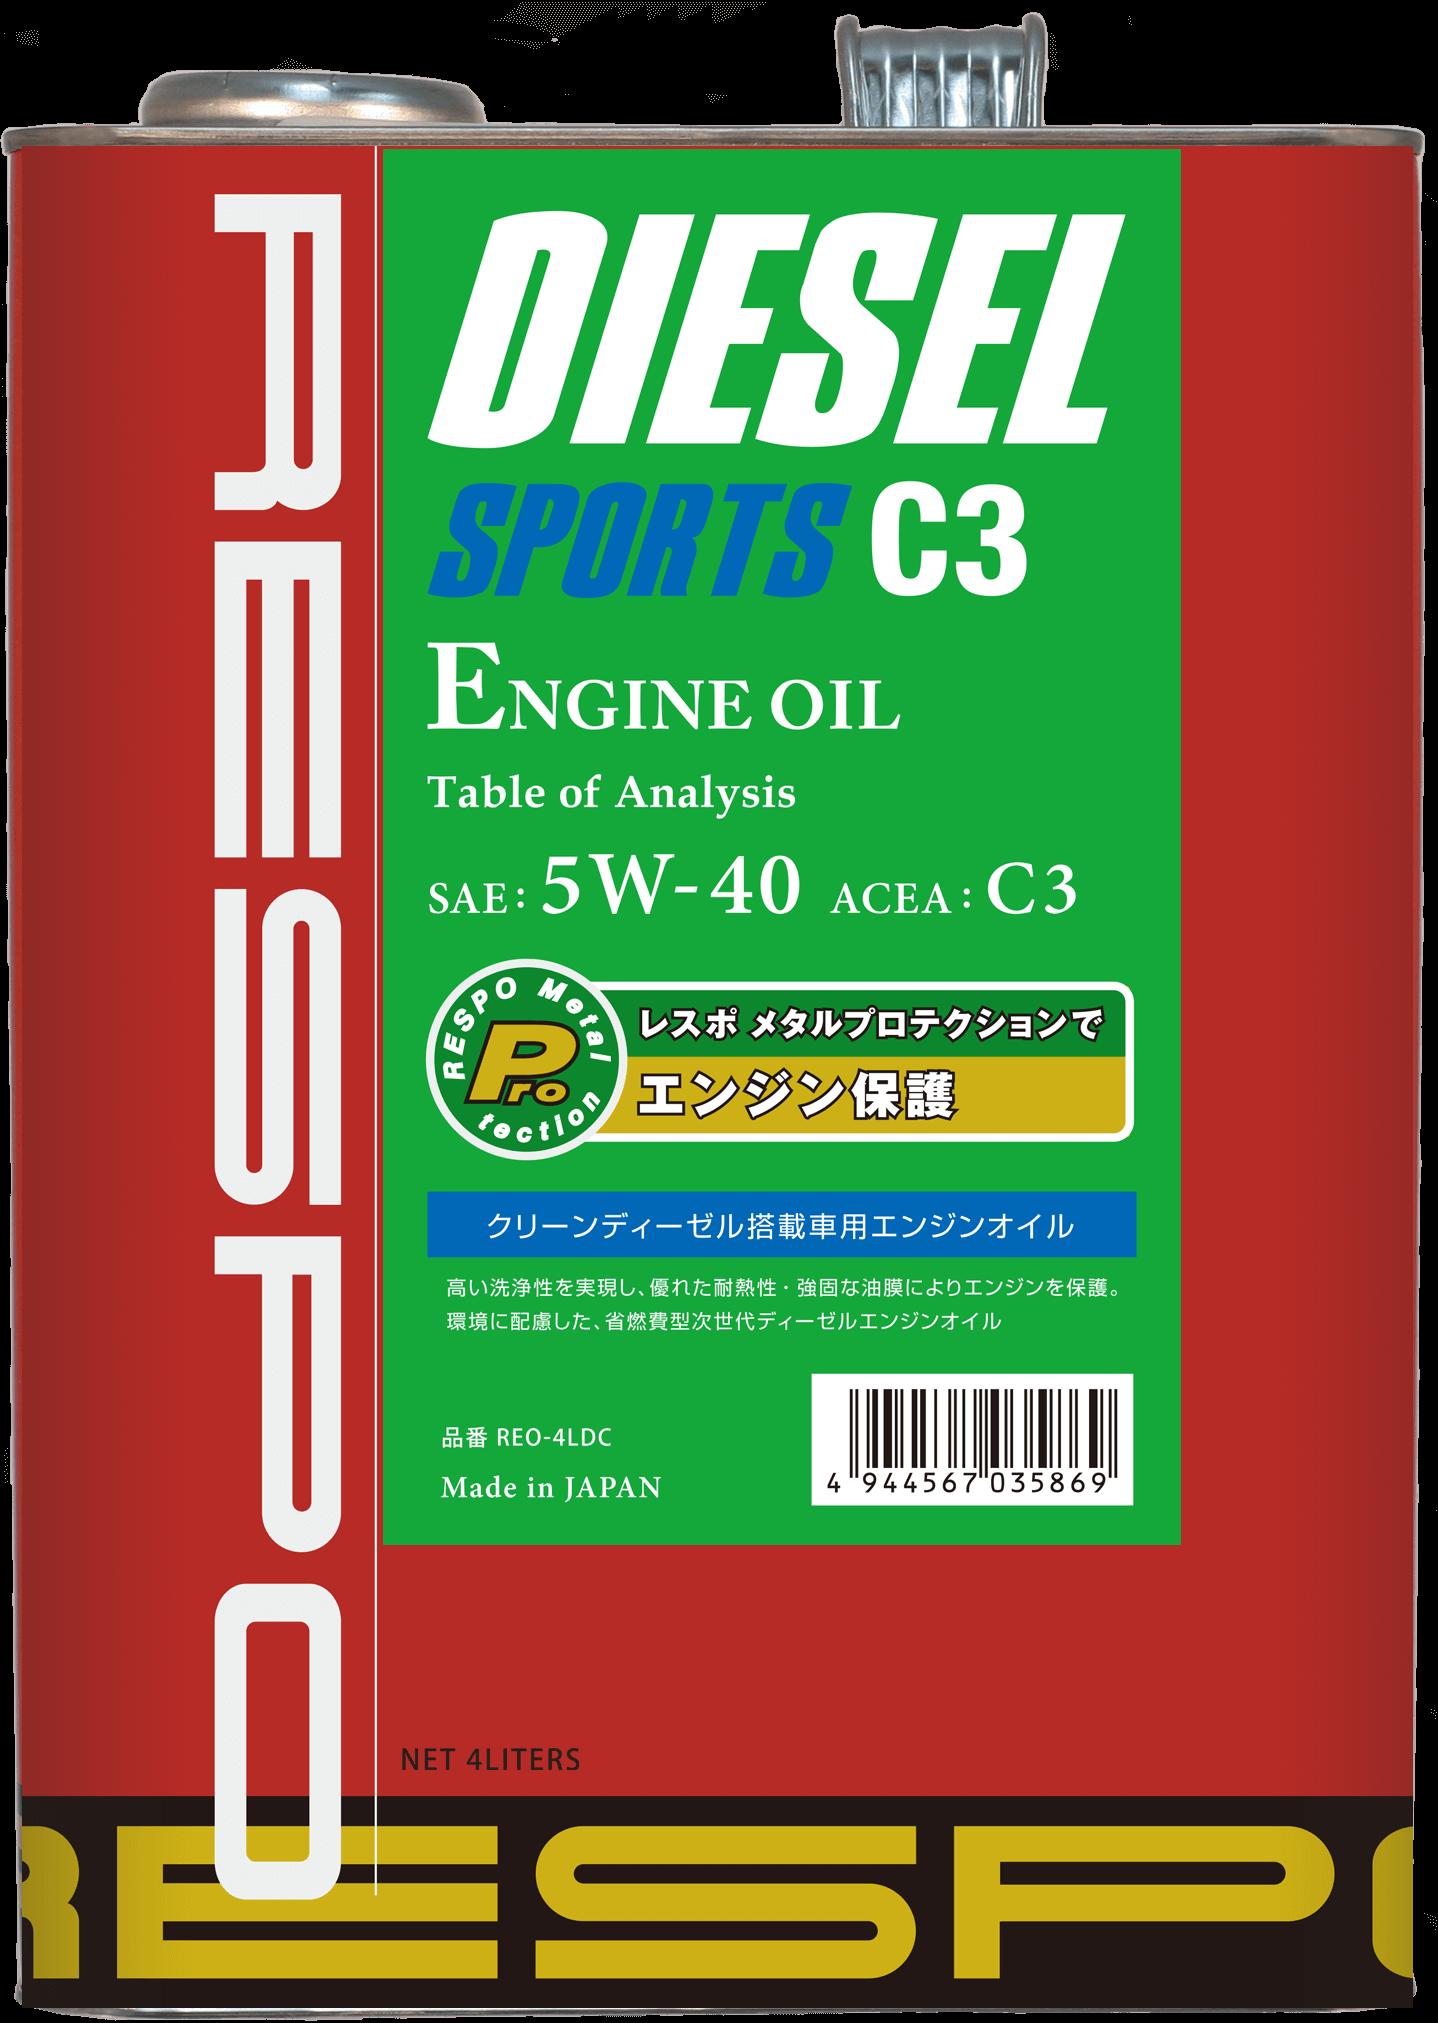 DIESEL SPORTS C3